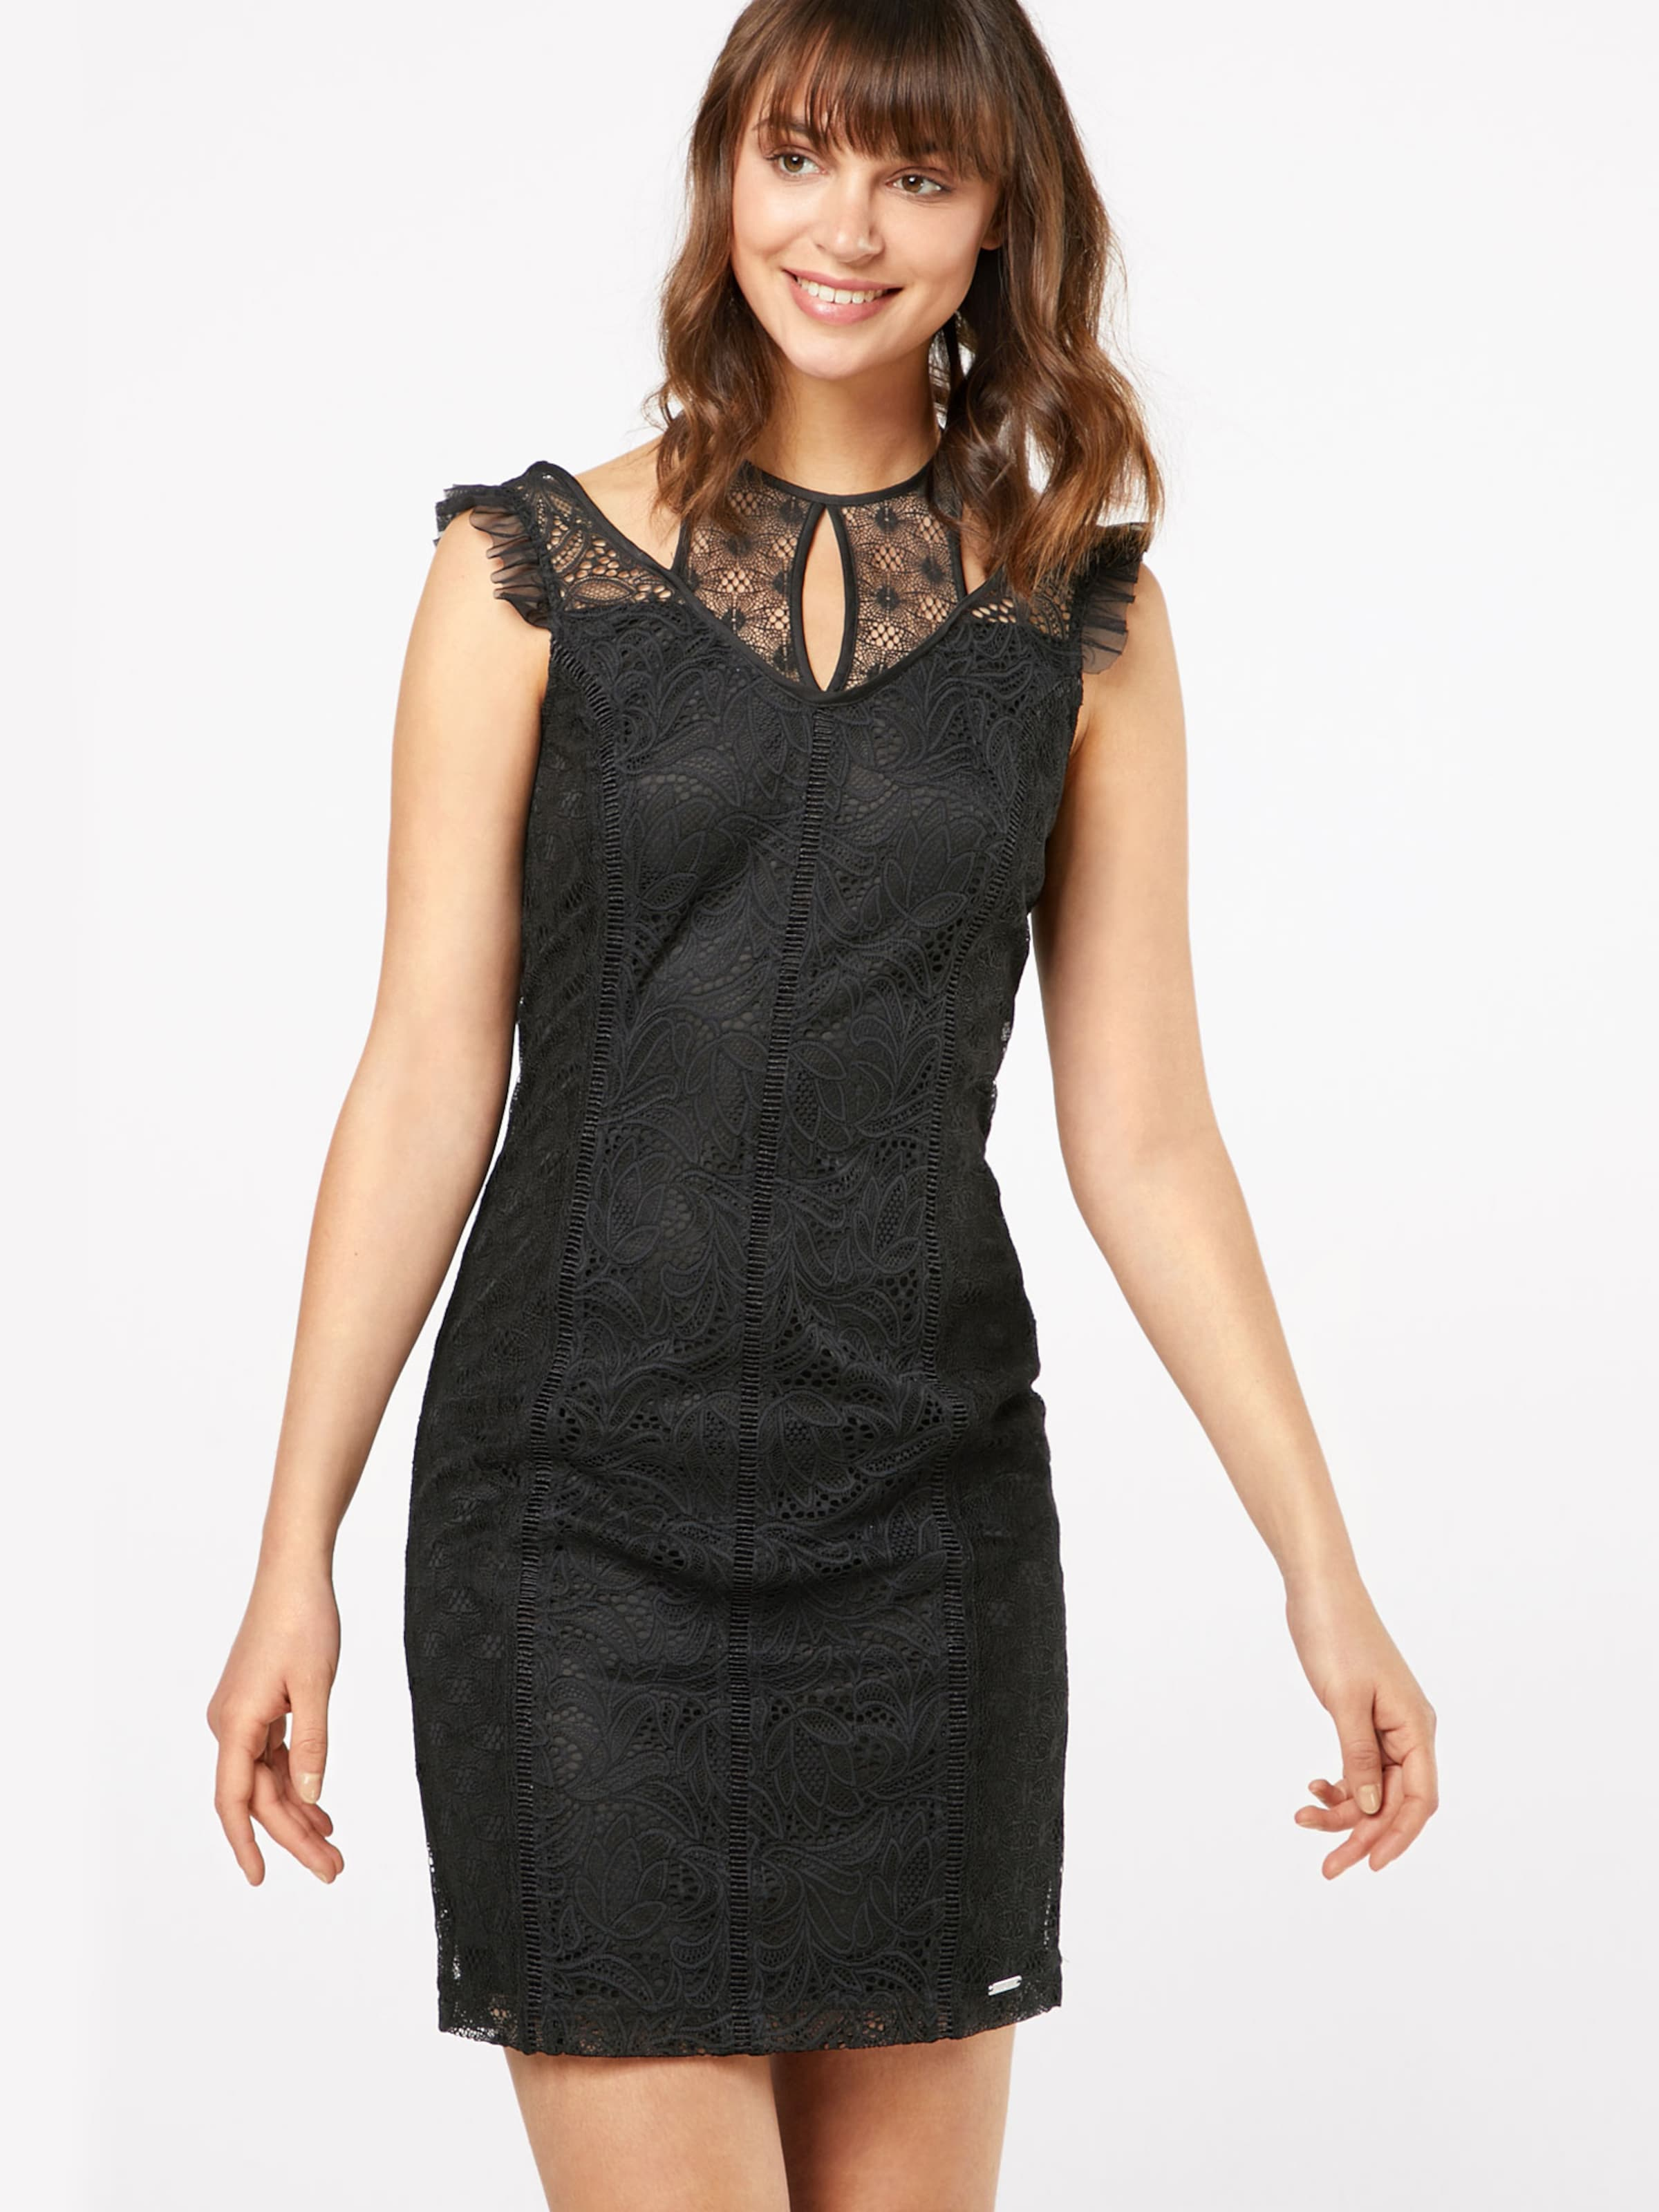 Footlocker Bilder Online GUESS Guess Spitzen-Kleid 'Vivian' Preise Im Netz Footaction Günstiger Preis ciGhpY